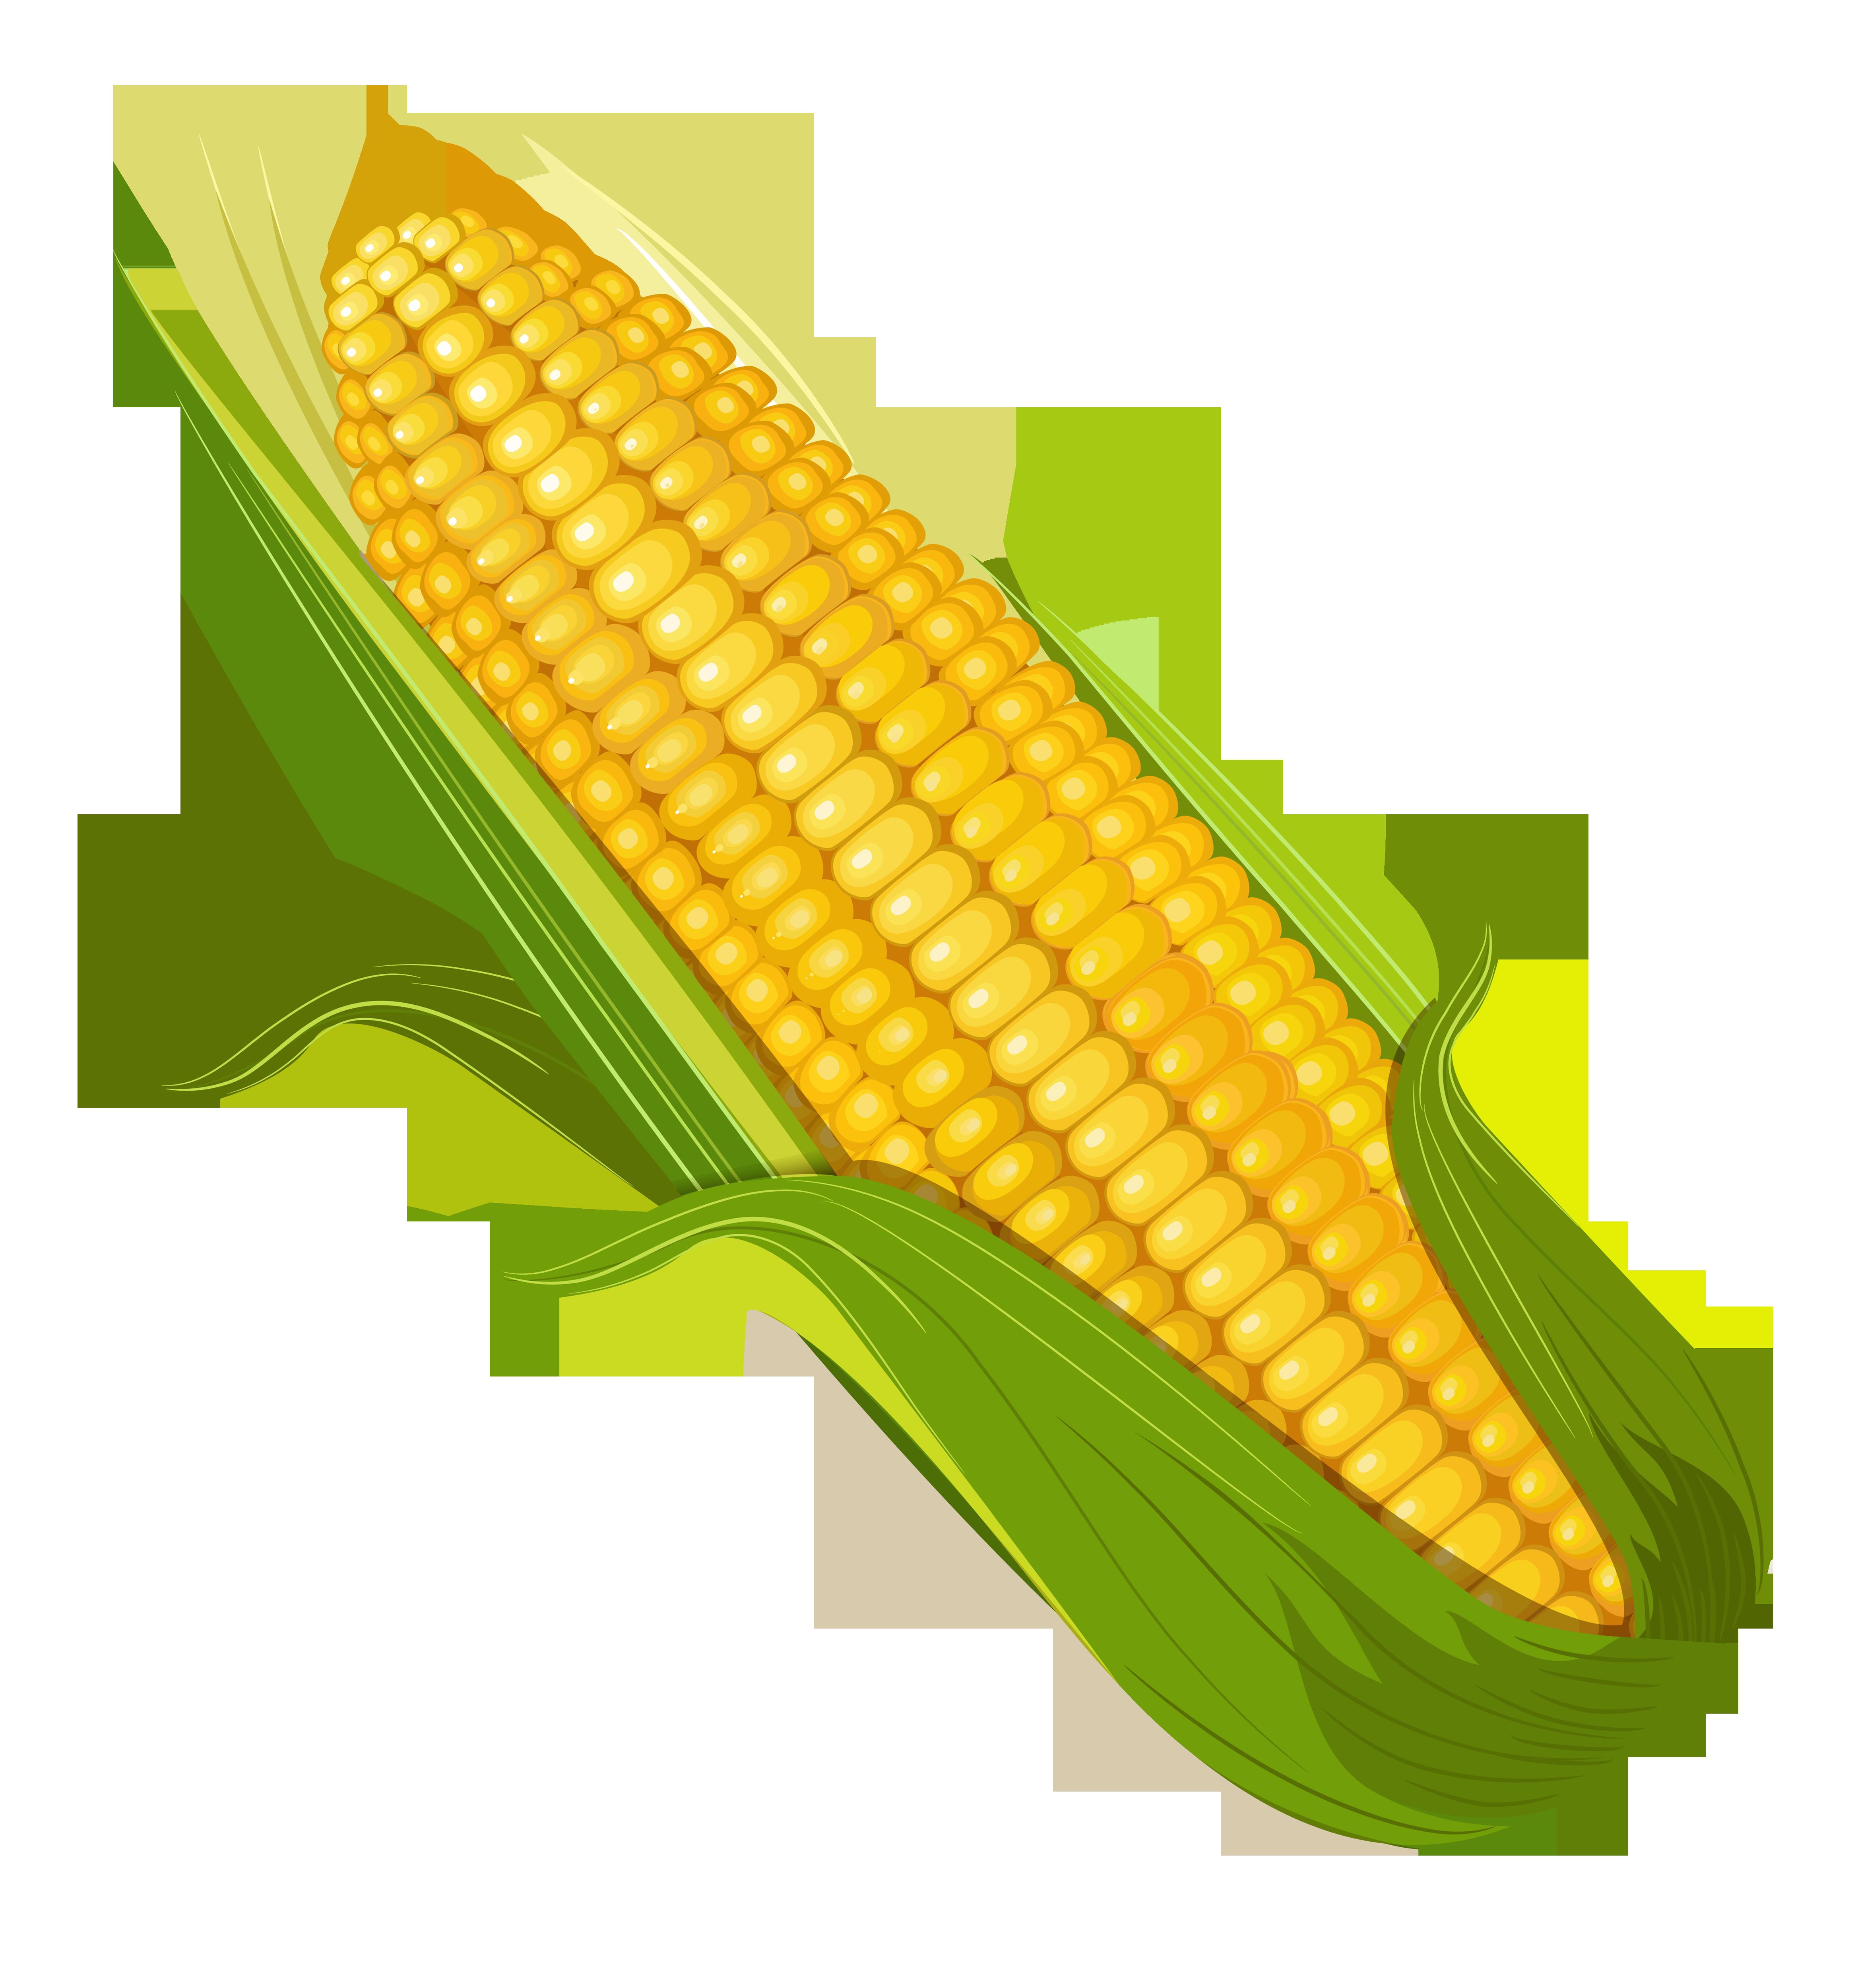 0 d9f87 59264cb8 orig  4664 u00d75000  owoce pinterest vegetable clip art black and white vegetables clip art free